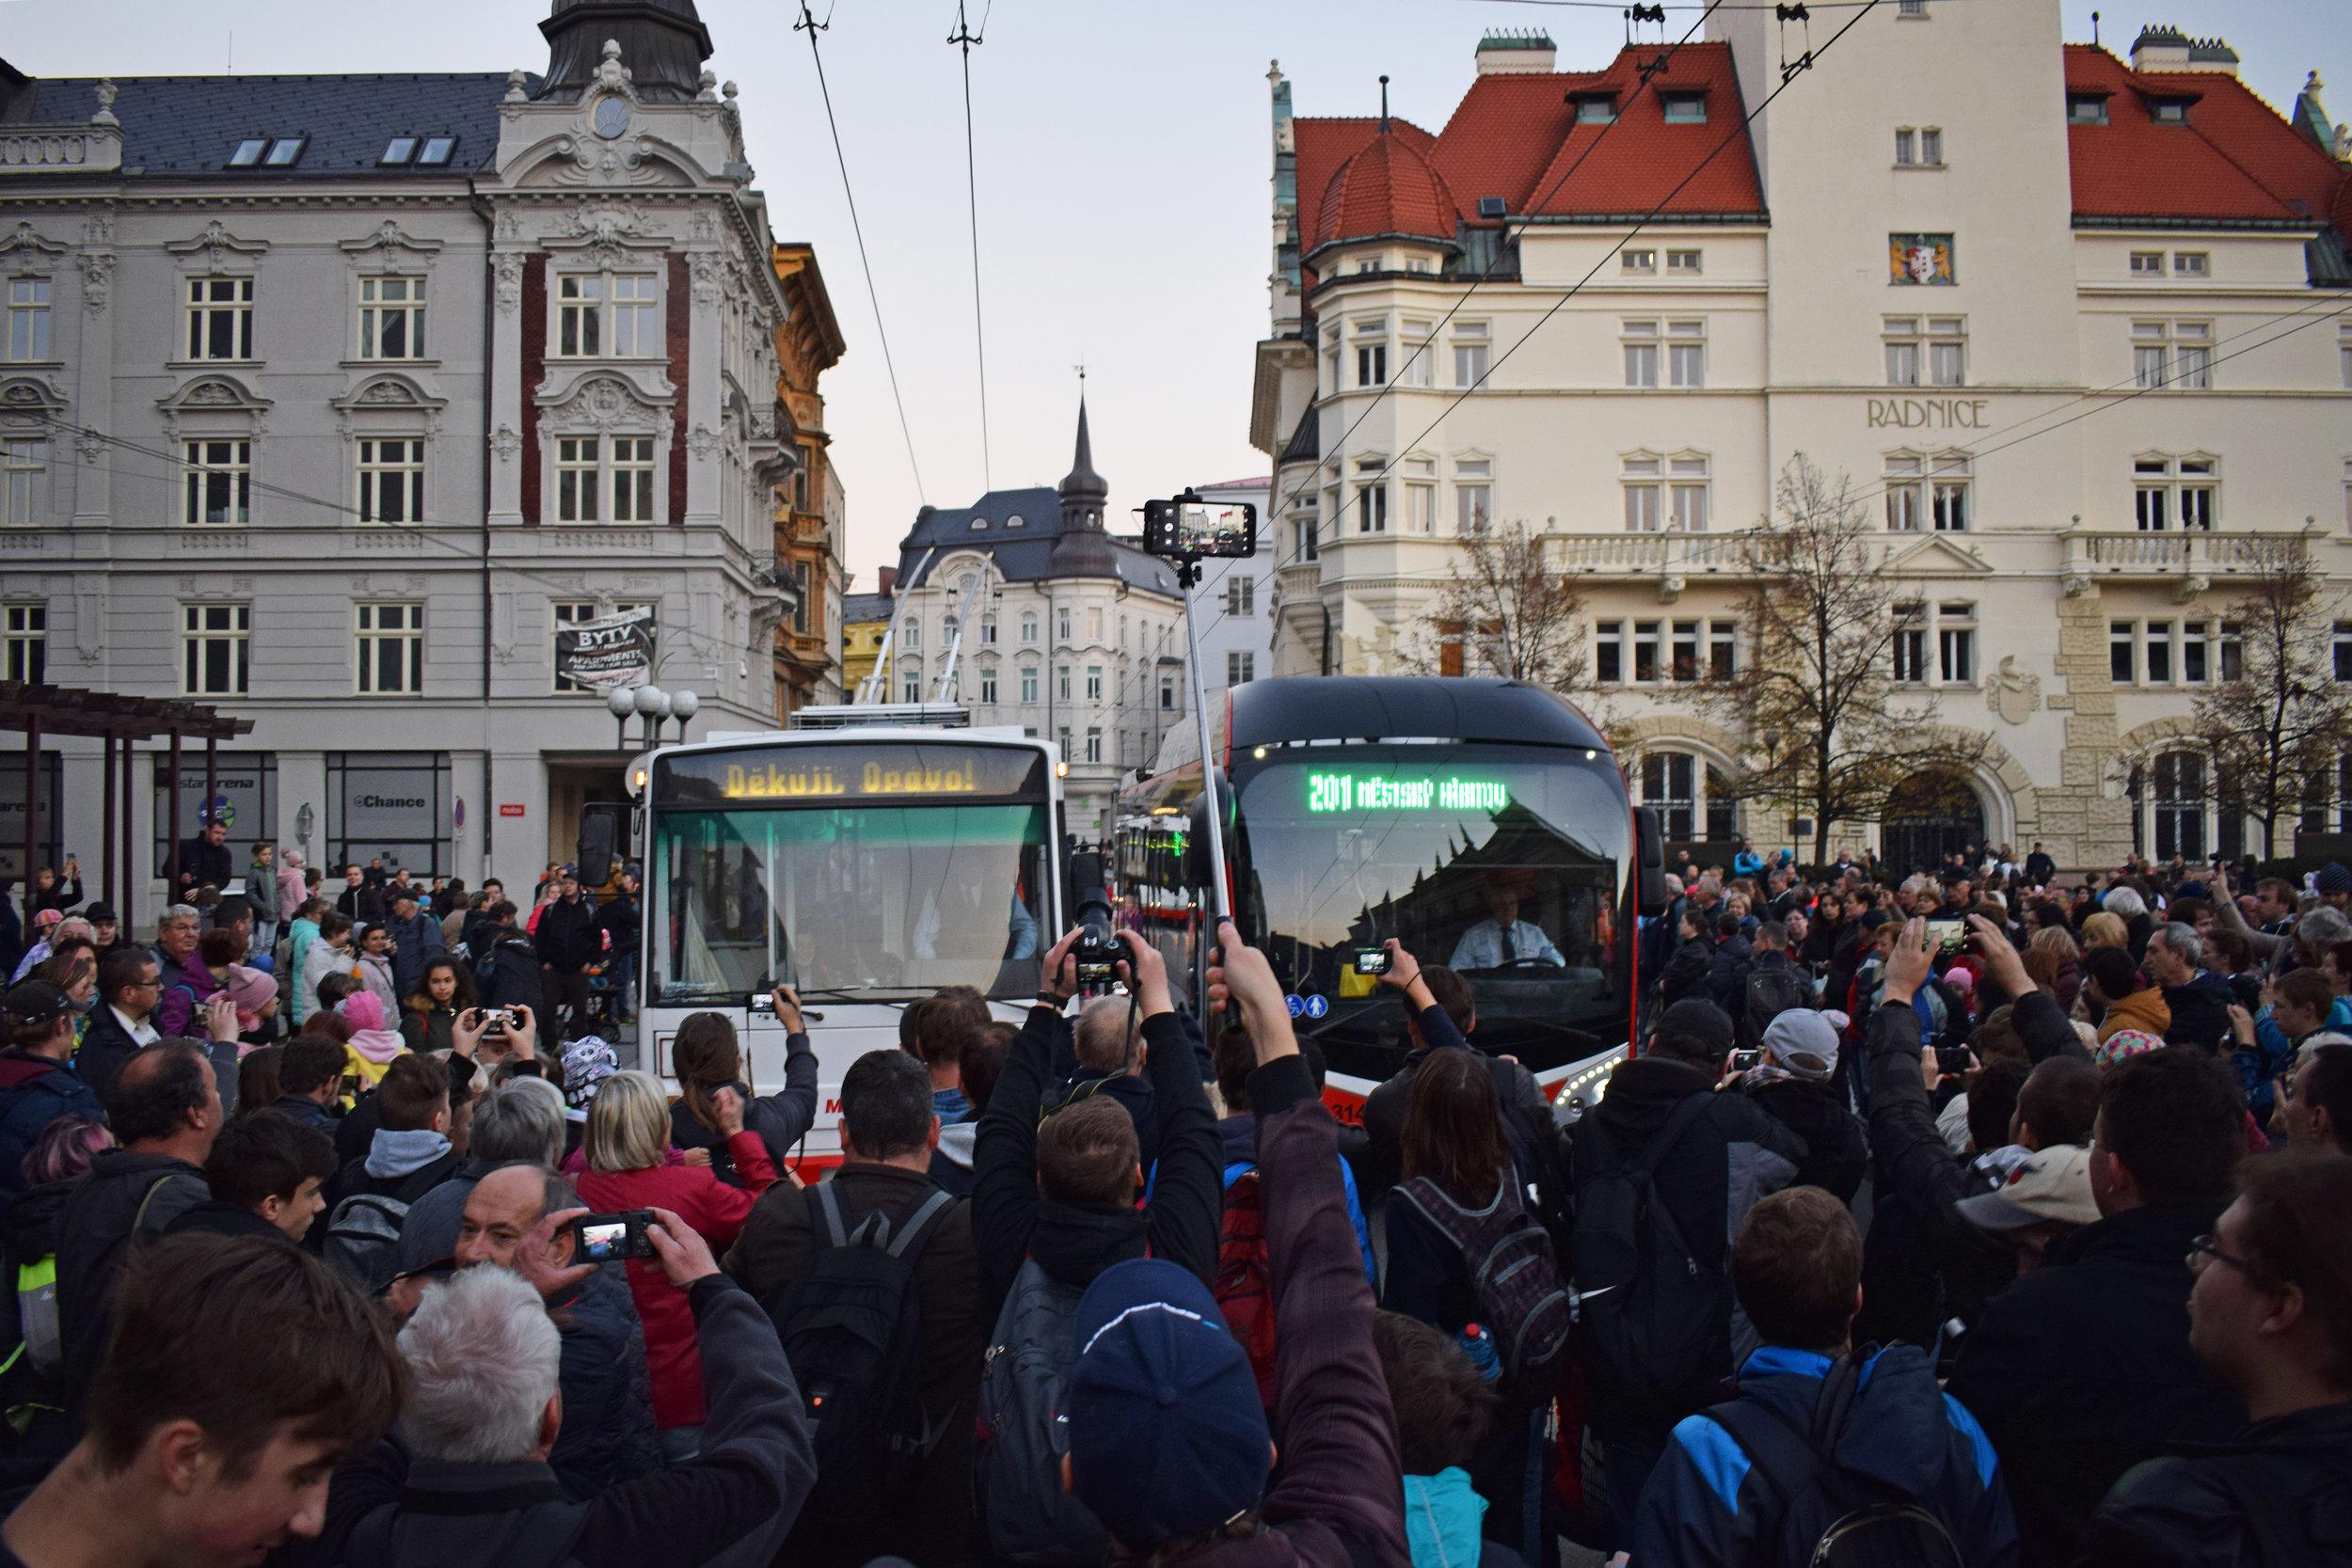 """Děkuji, Opavo"". Trolejbus Škoda 14 Tr se loučí s obyvateli Opavy. A obyvatelé se loučí s ním. (foto: Libor Hinčica)"